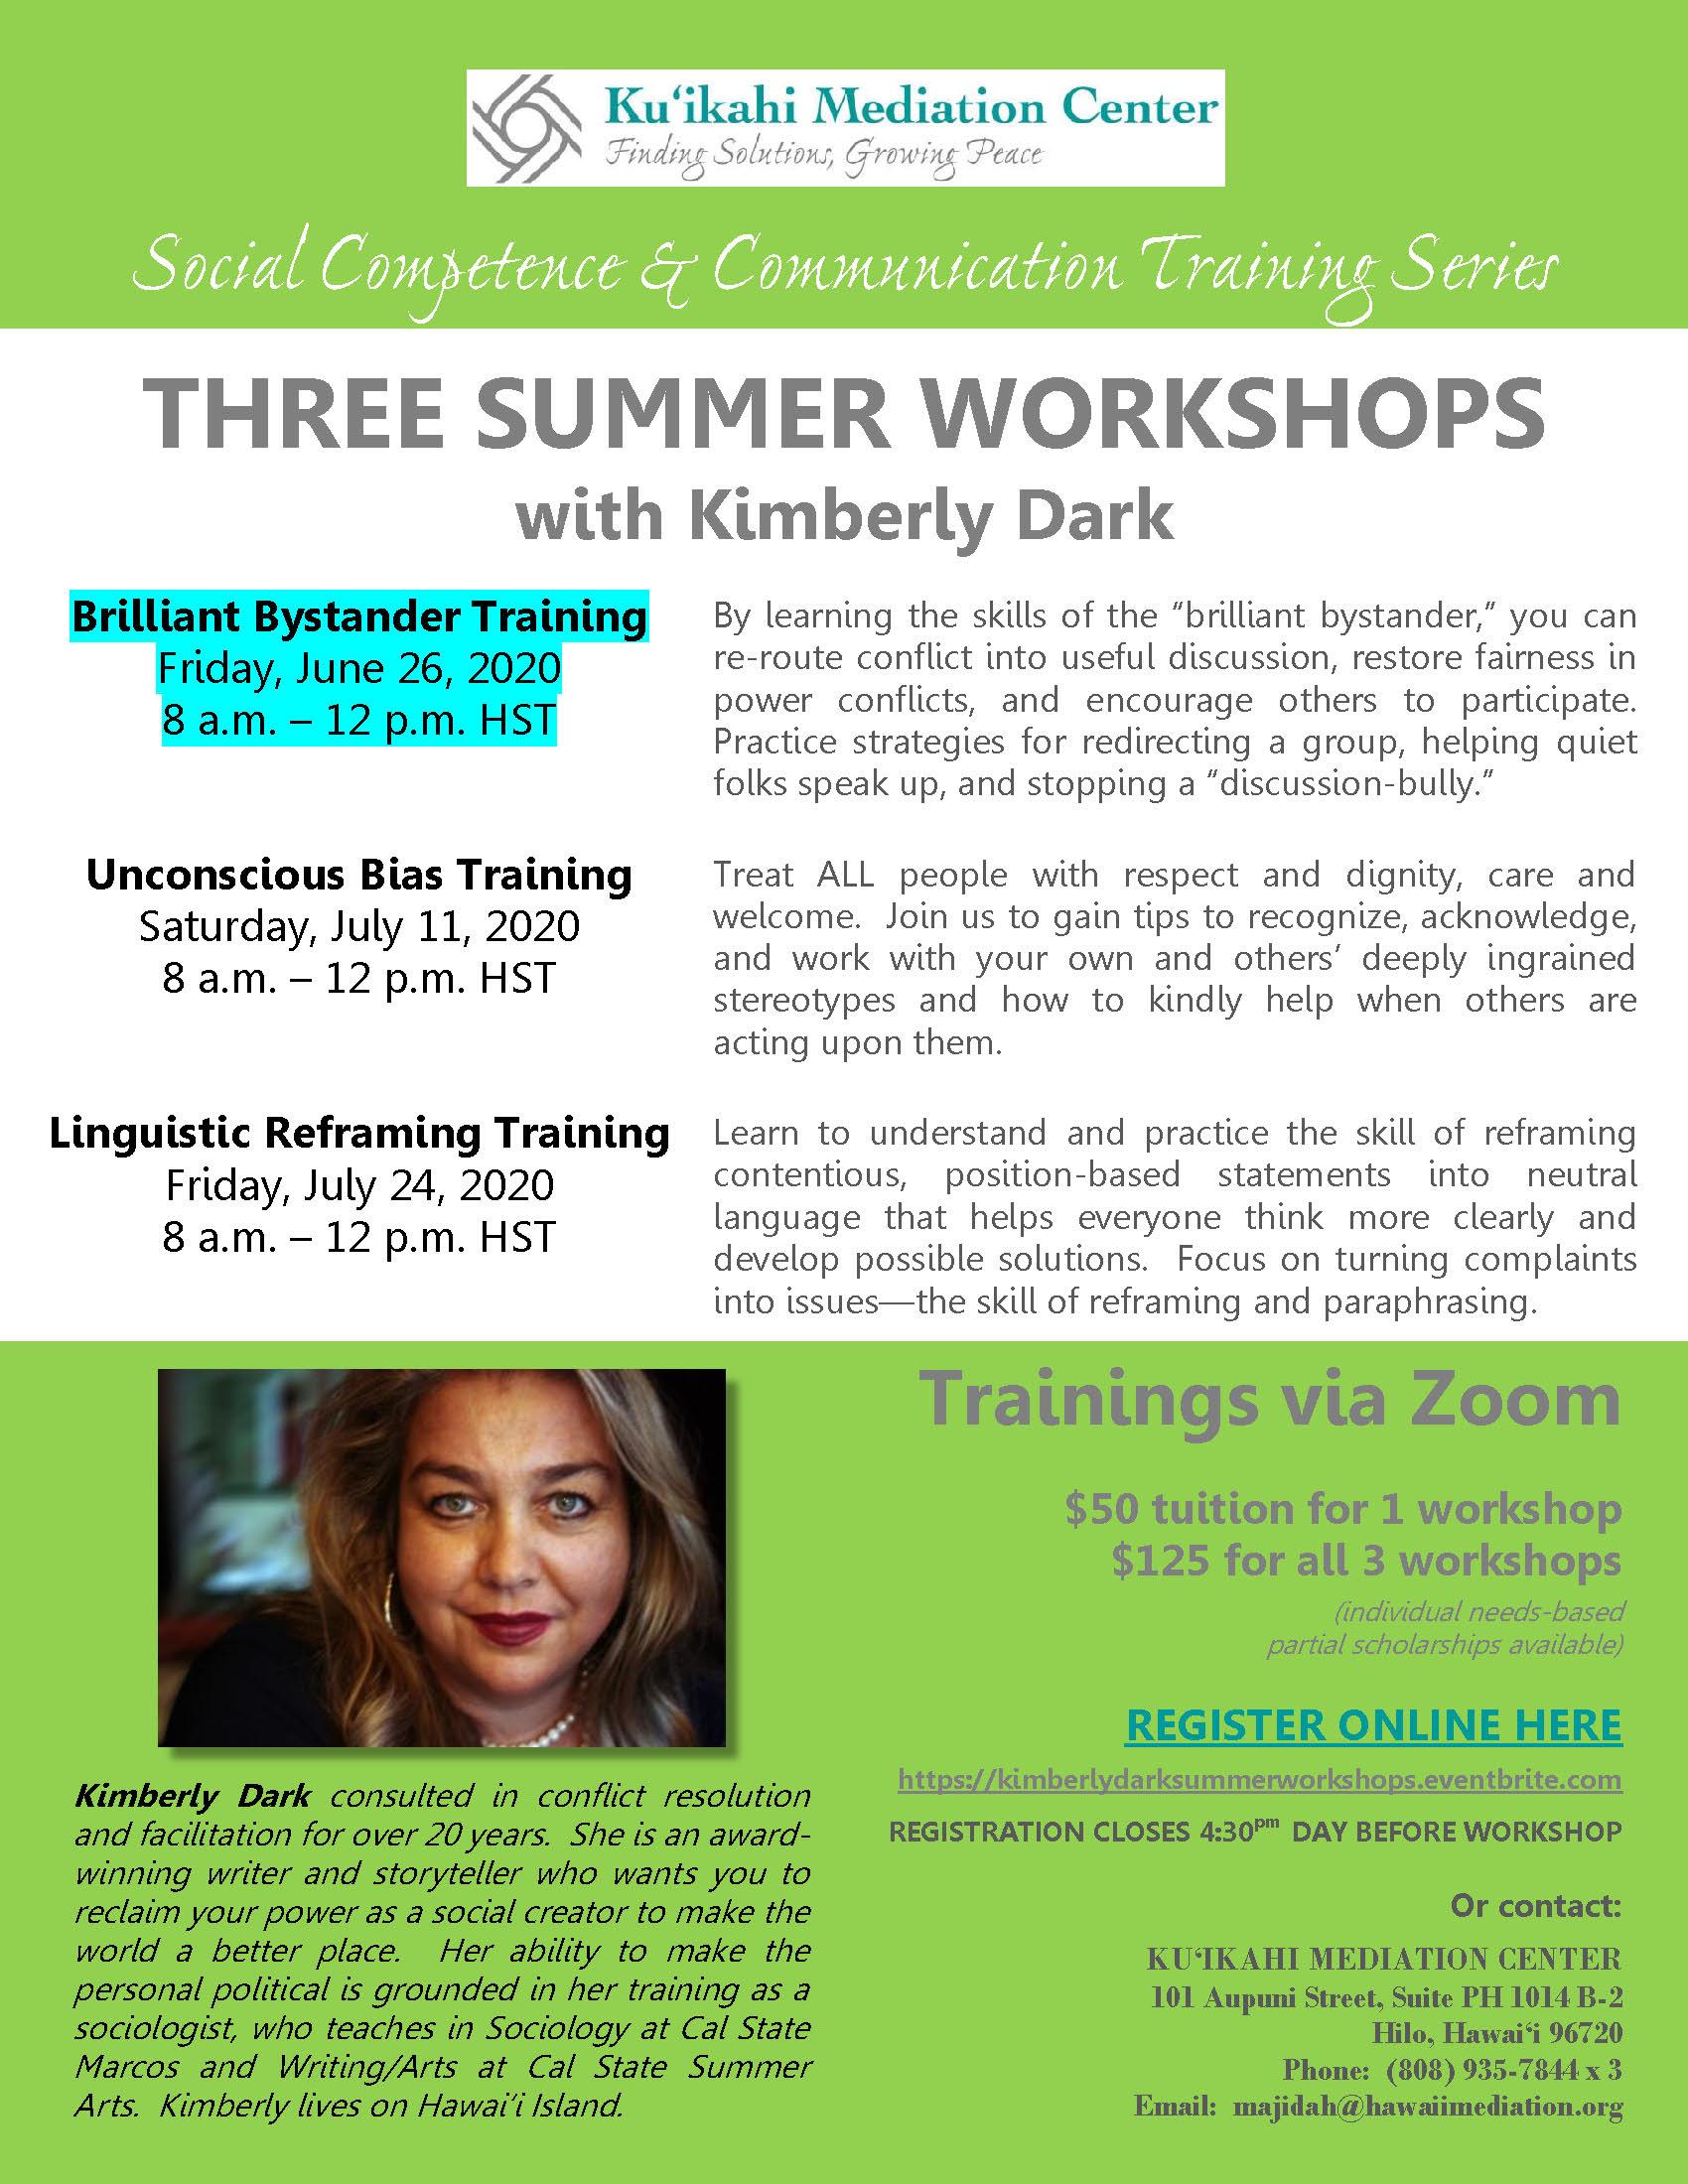 Flyer - Kimberly Dark Three Summer Workshops - Brilliant Bystander Training